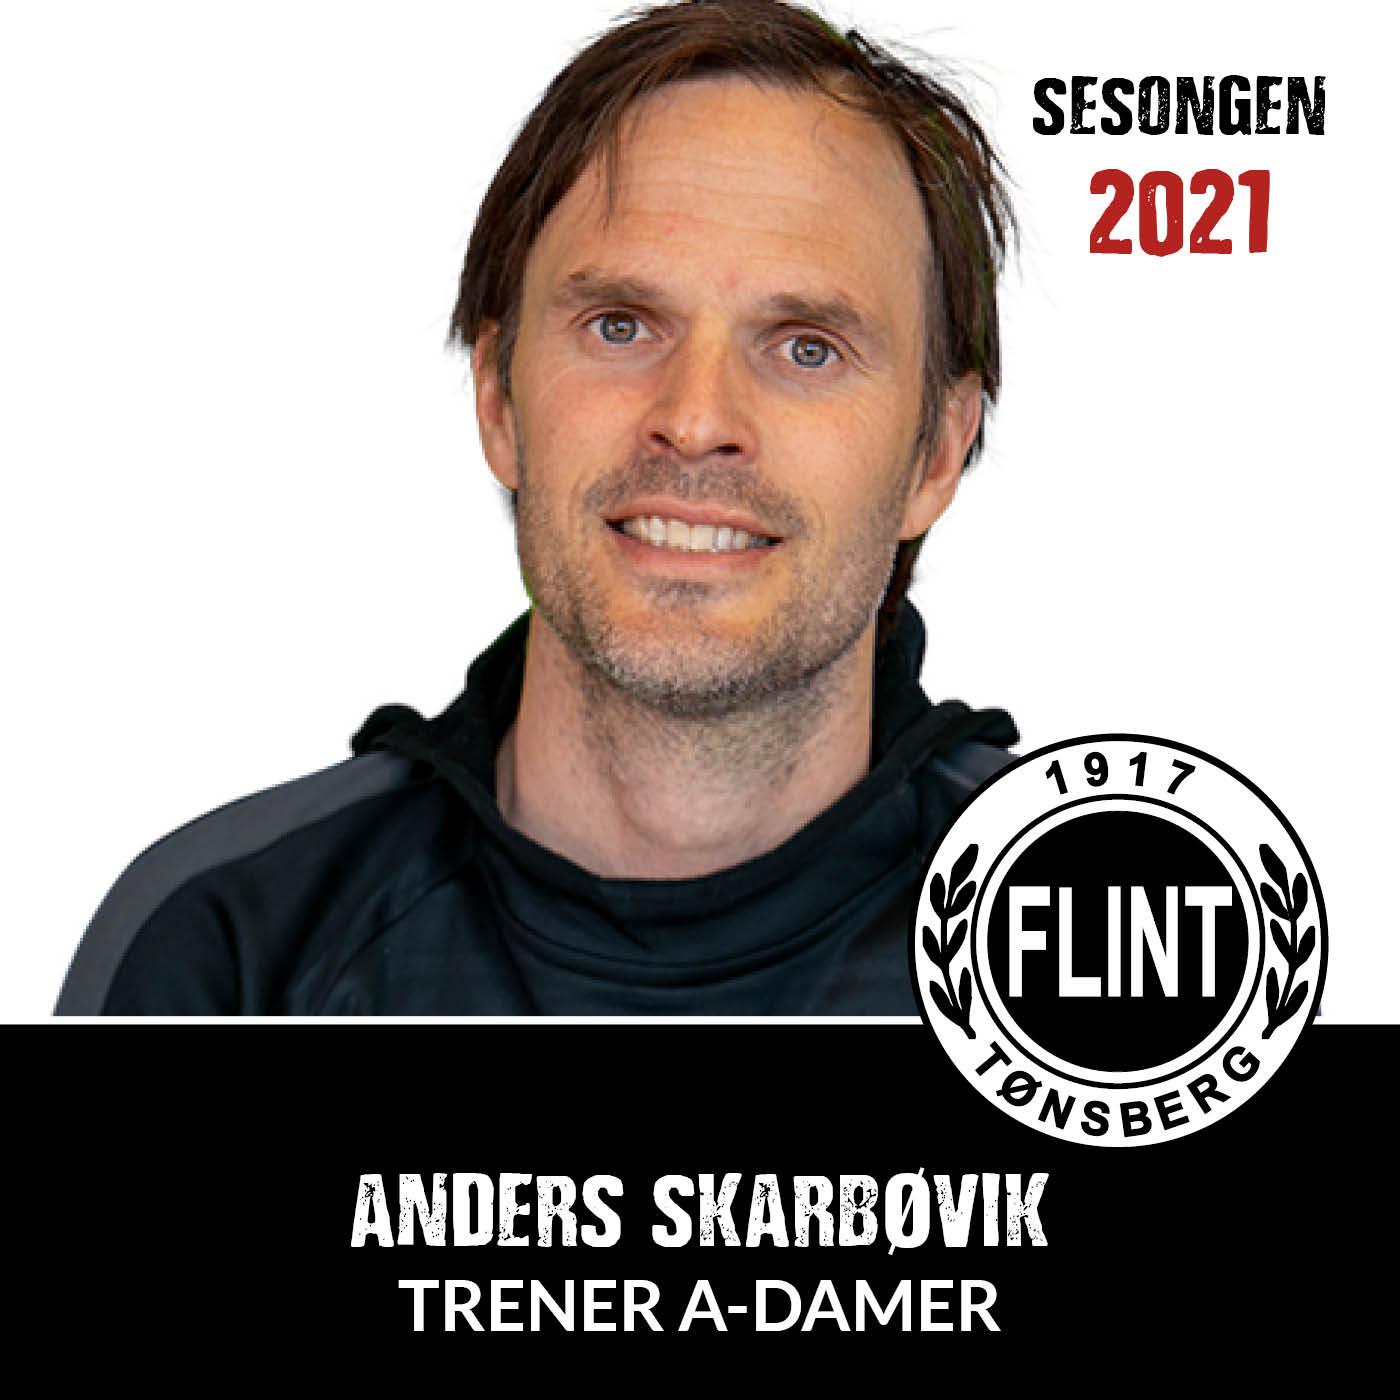 https://www.flintfotball.no/wp-content/uploads/2021/02/Trenere-Anders-Skarbovik.jpg